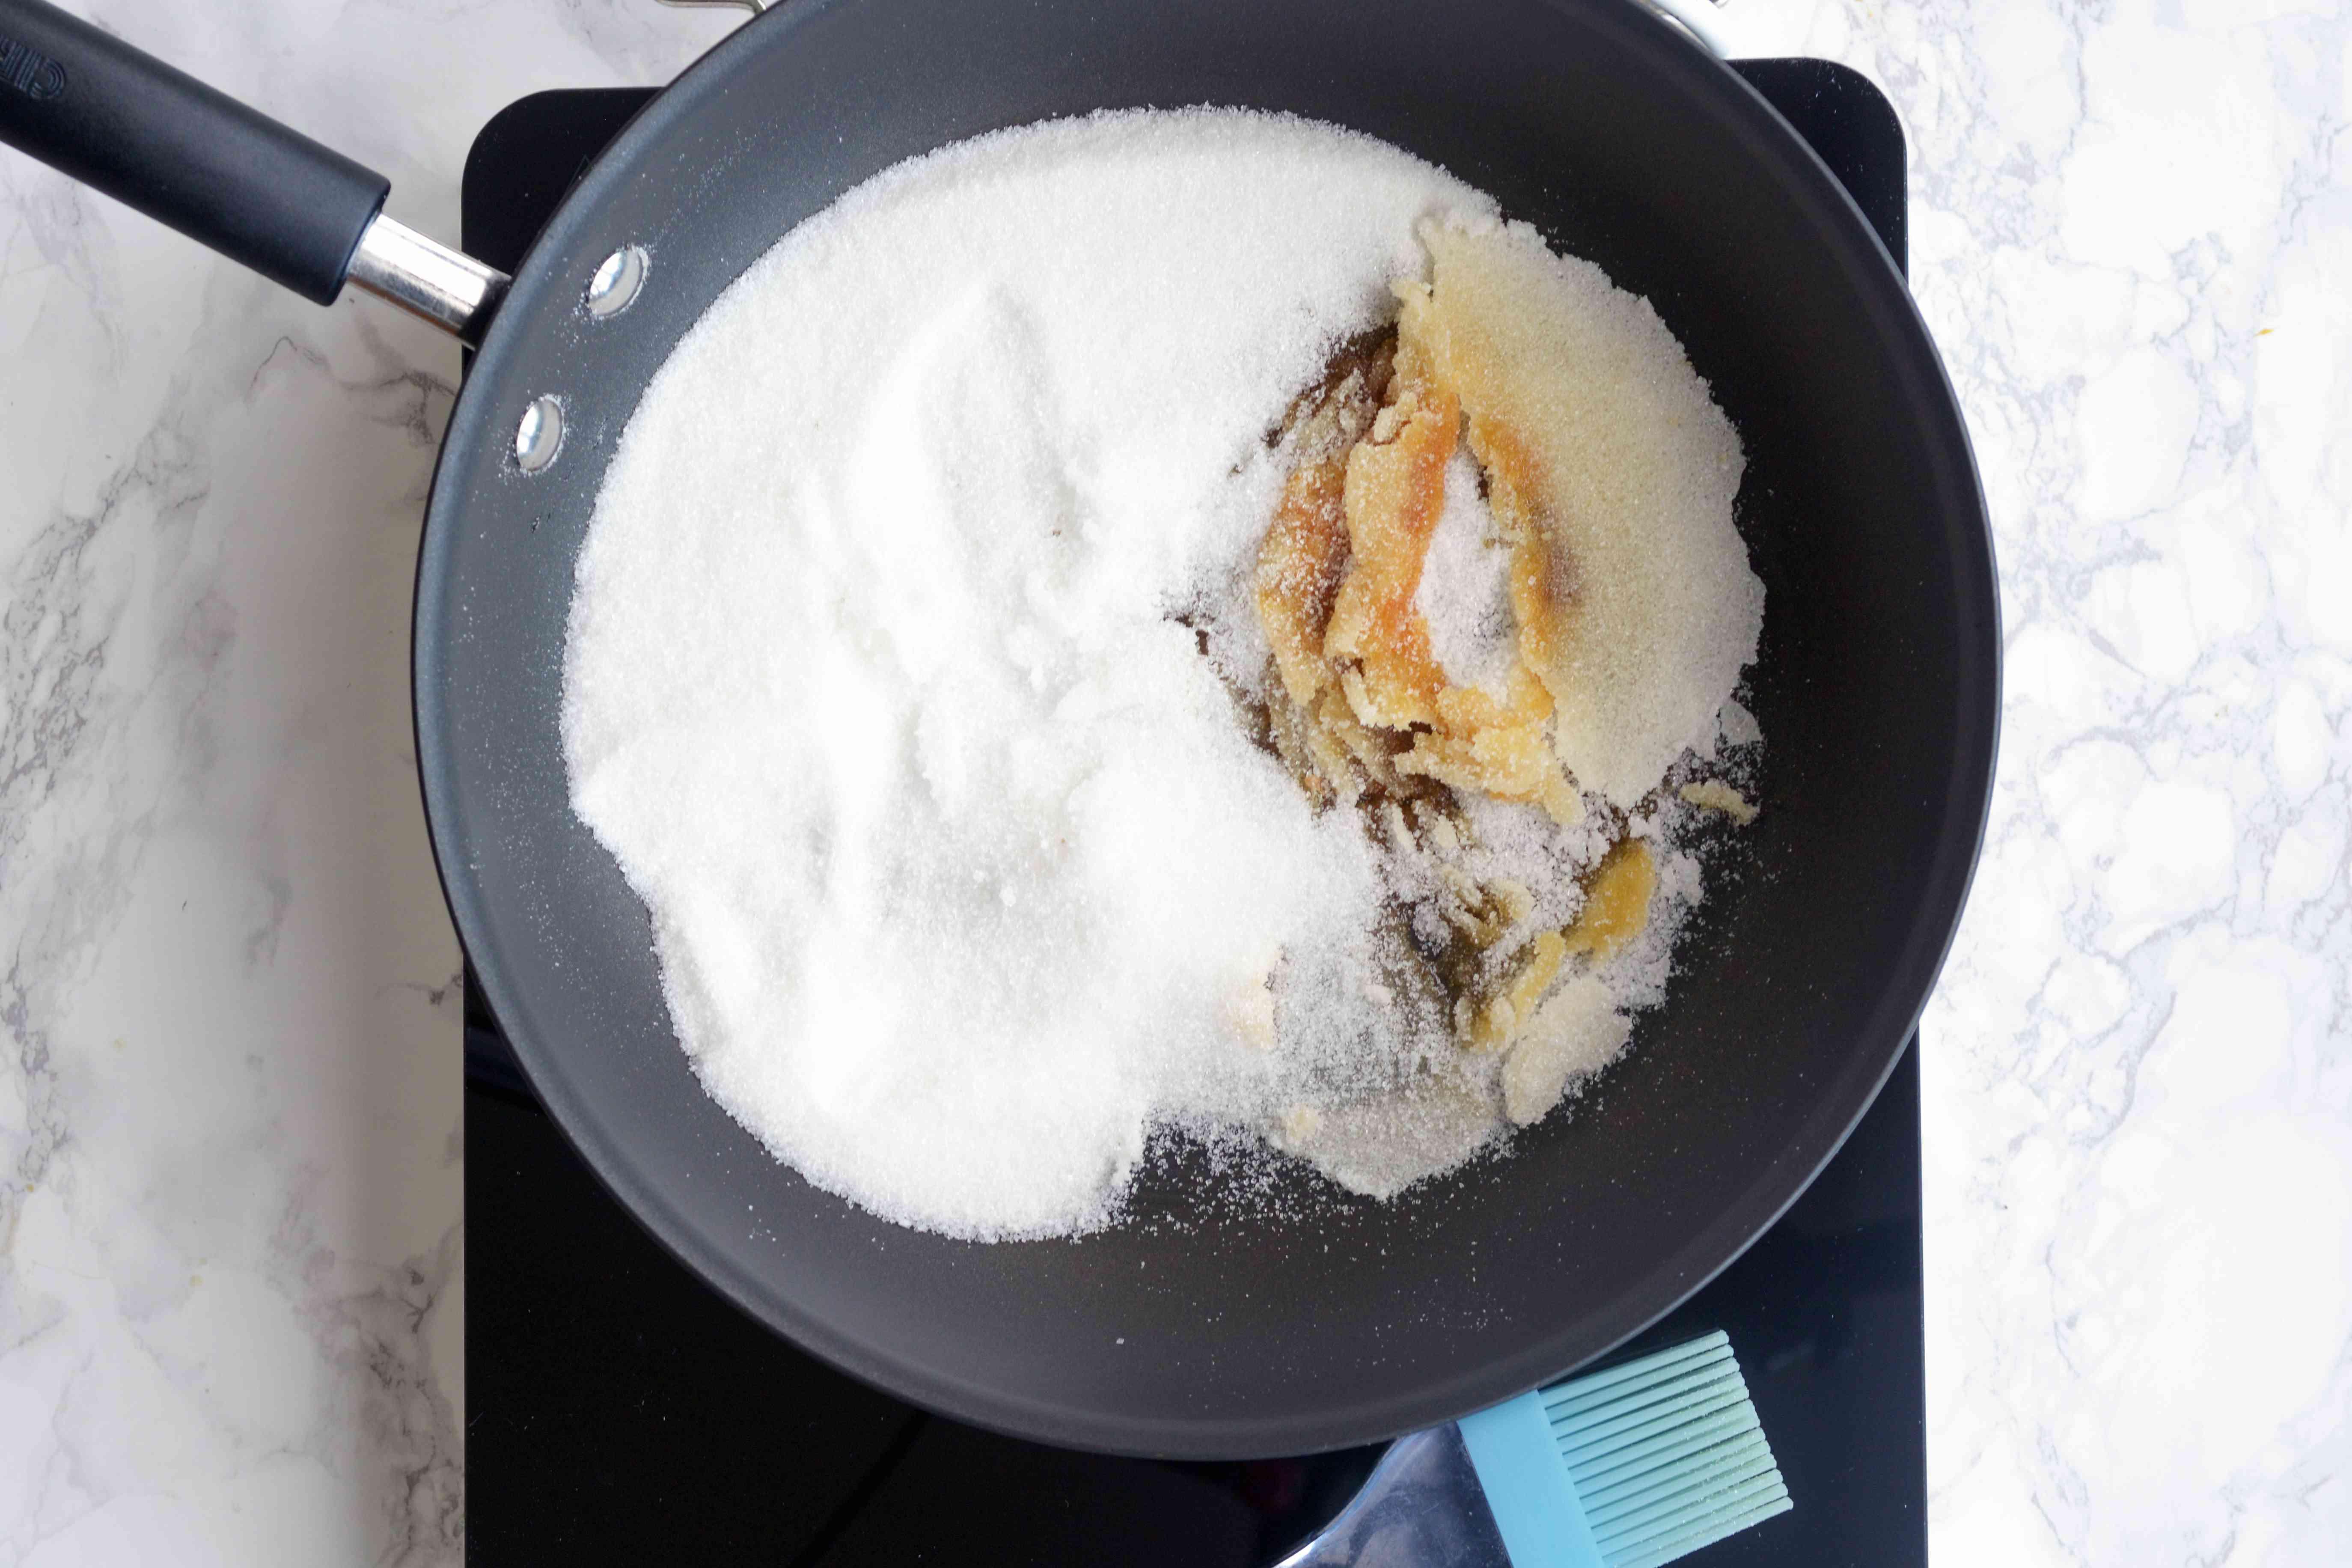 Sugar starting to melt in a pan